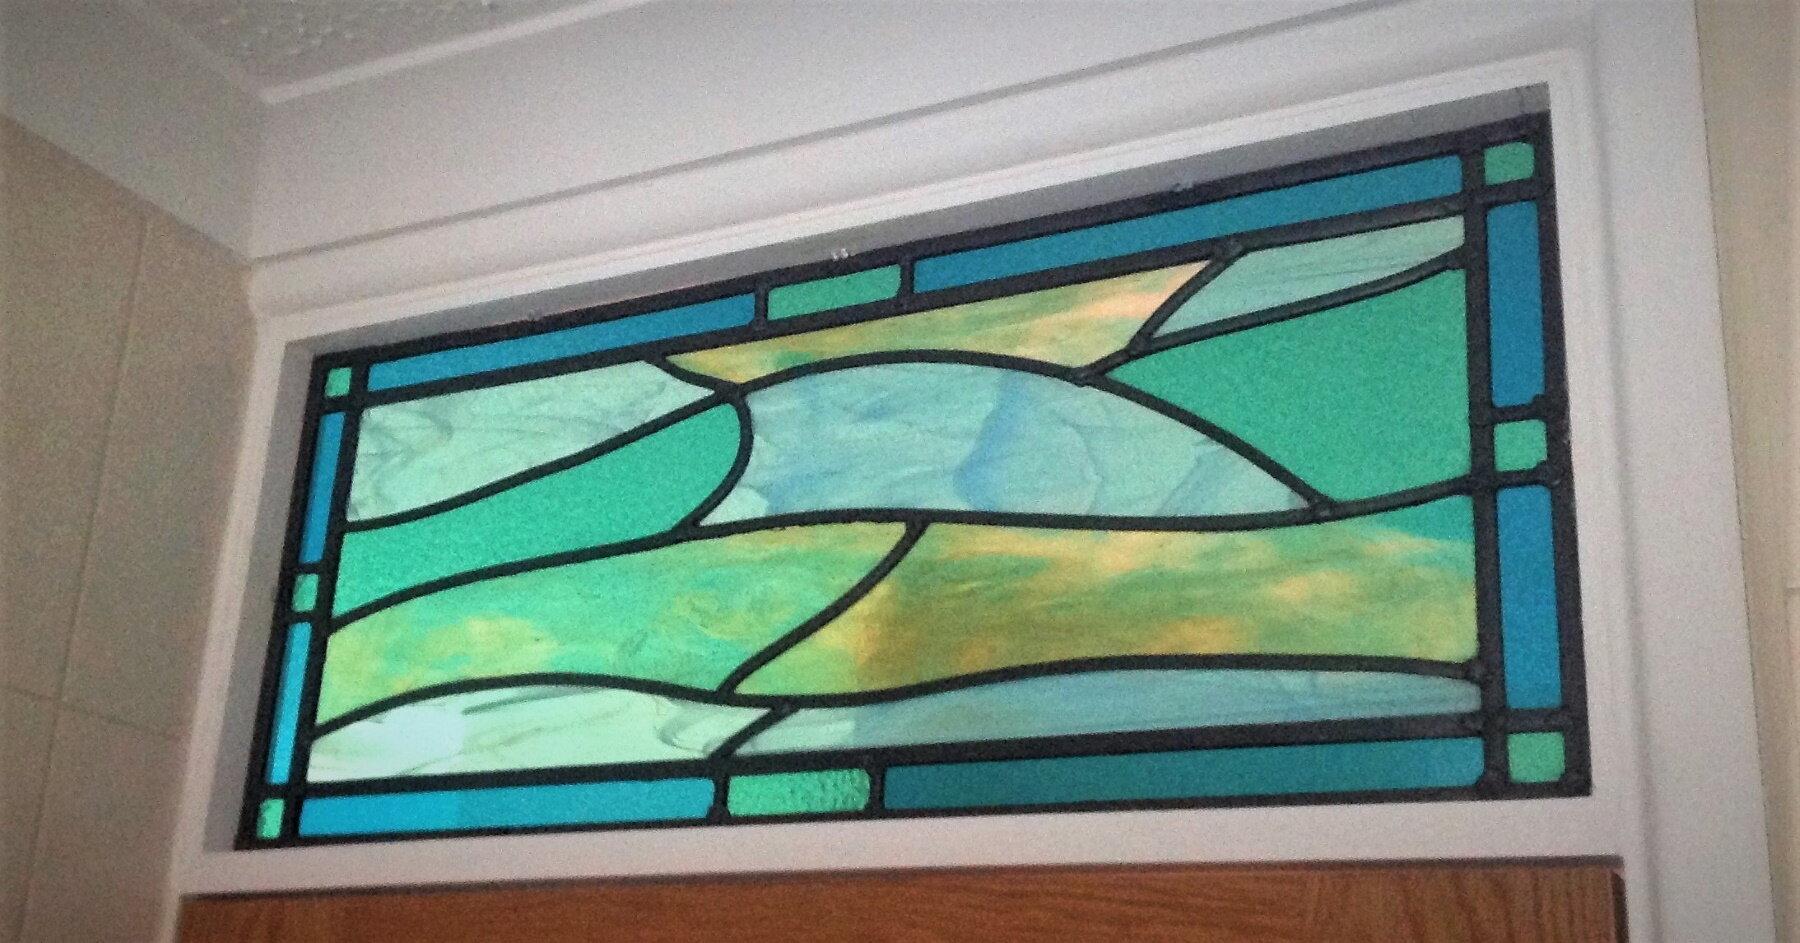 eva-glass-design-blue-green-horizontal-seascape-stained-glass-window 5.jpg